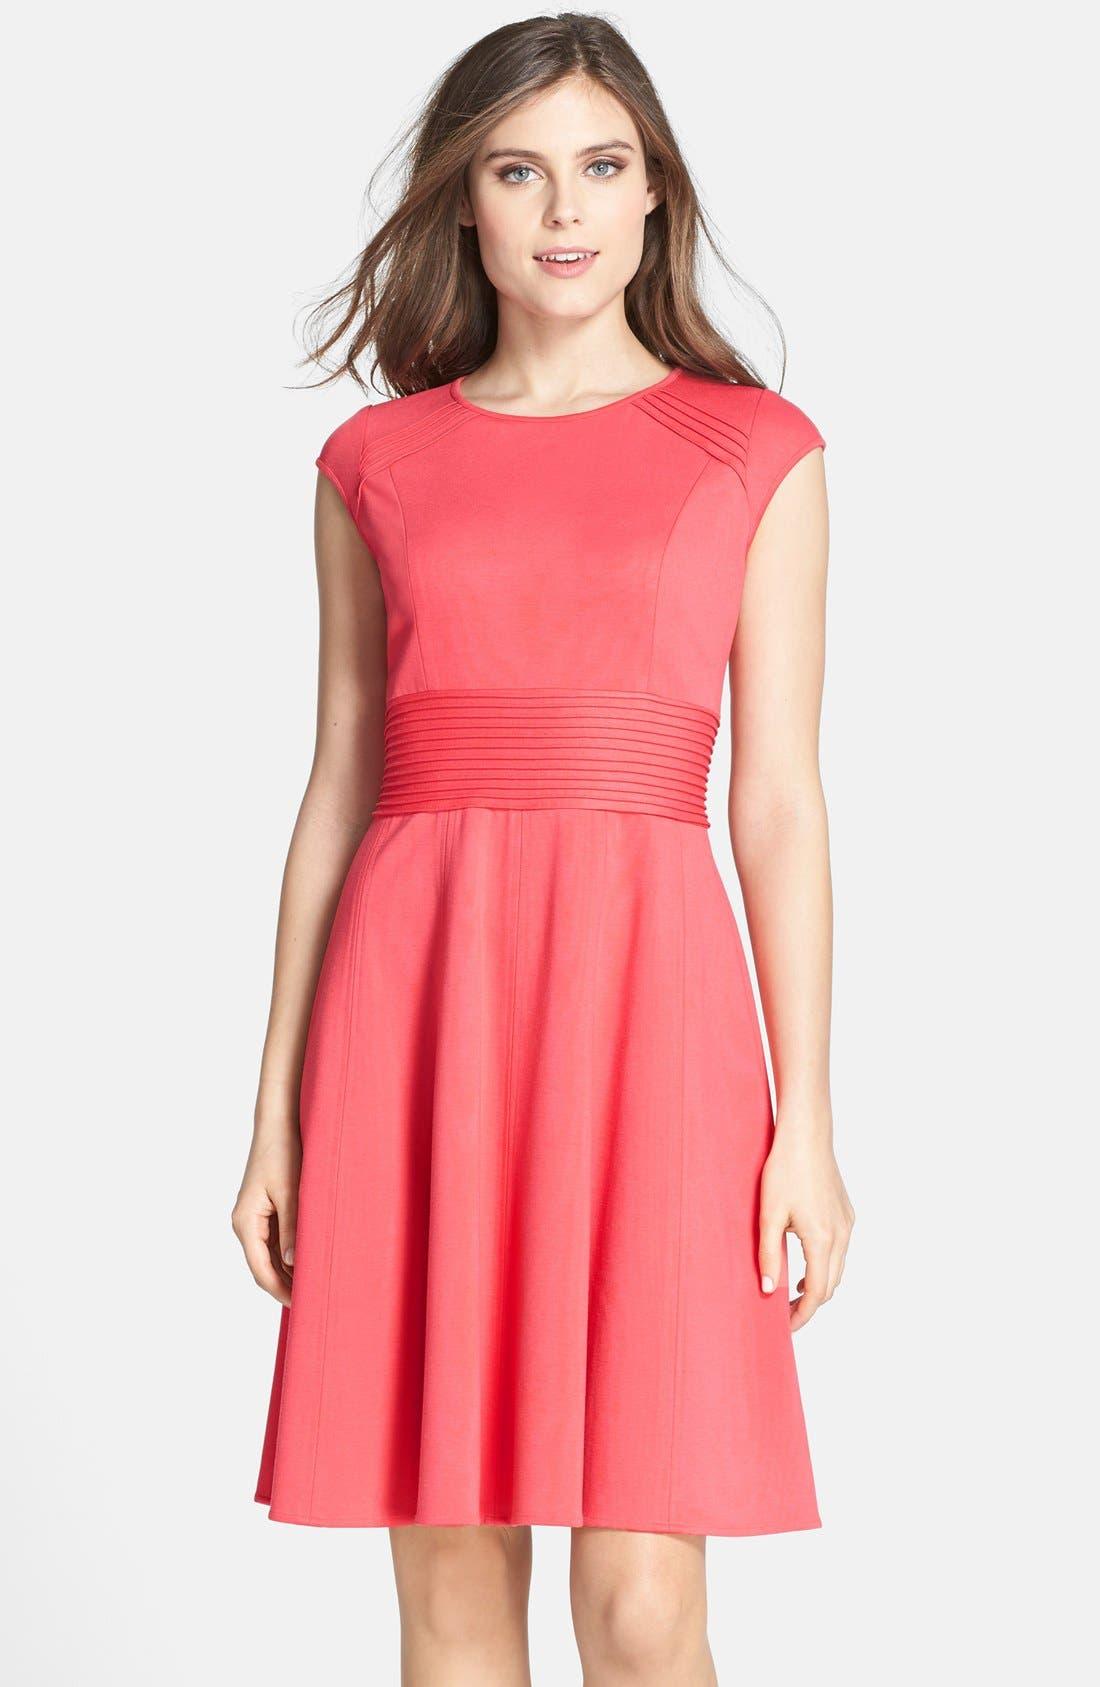 Alternate Image 1 Selected - Eliza J Pintucked Waist Seamed Ponte Knit Fit & Flare Dress